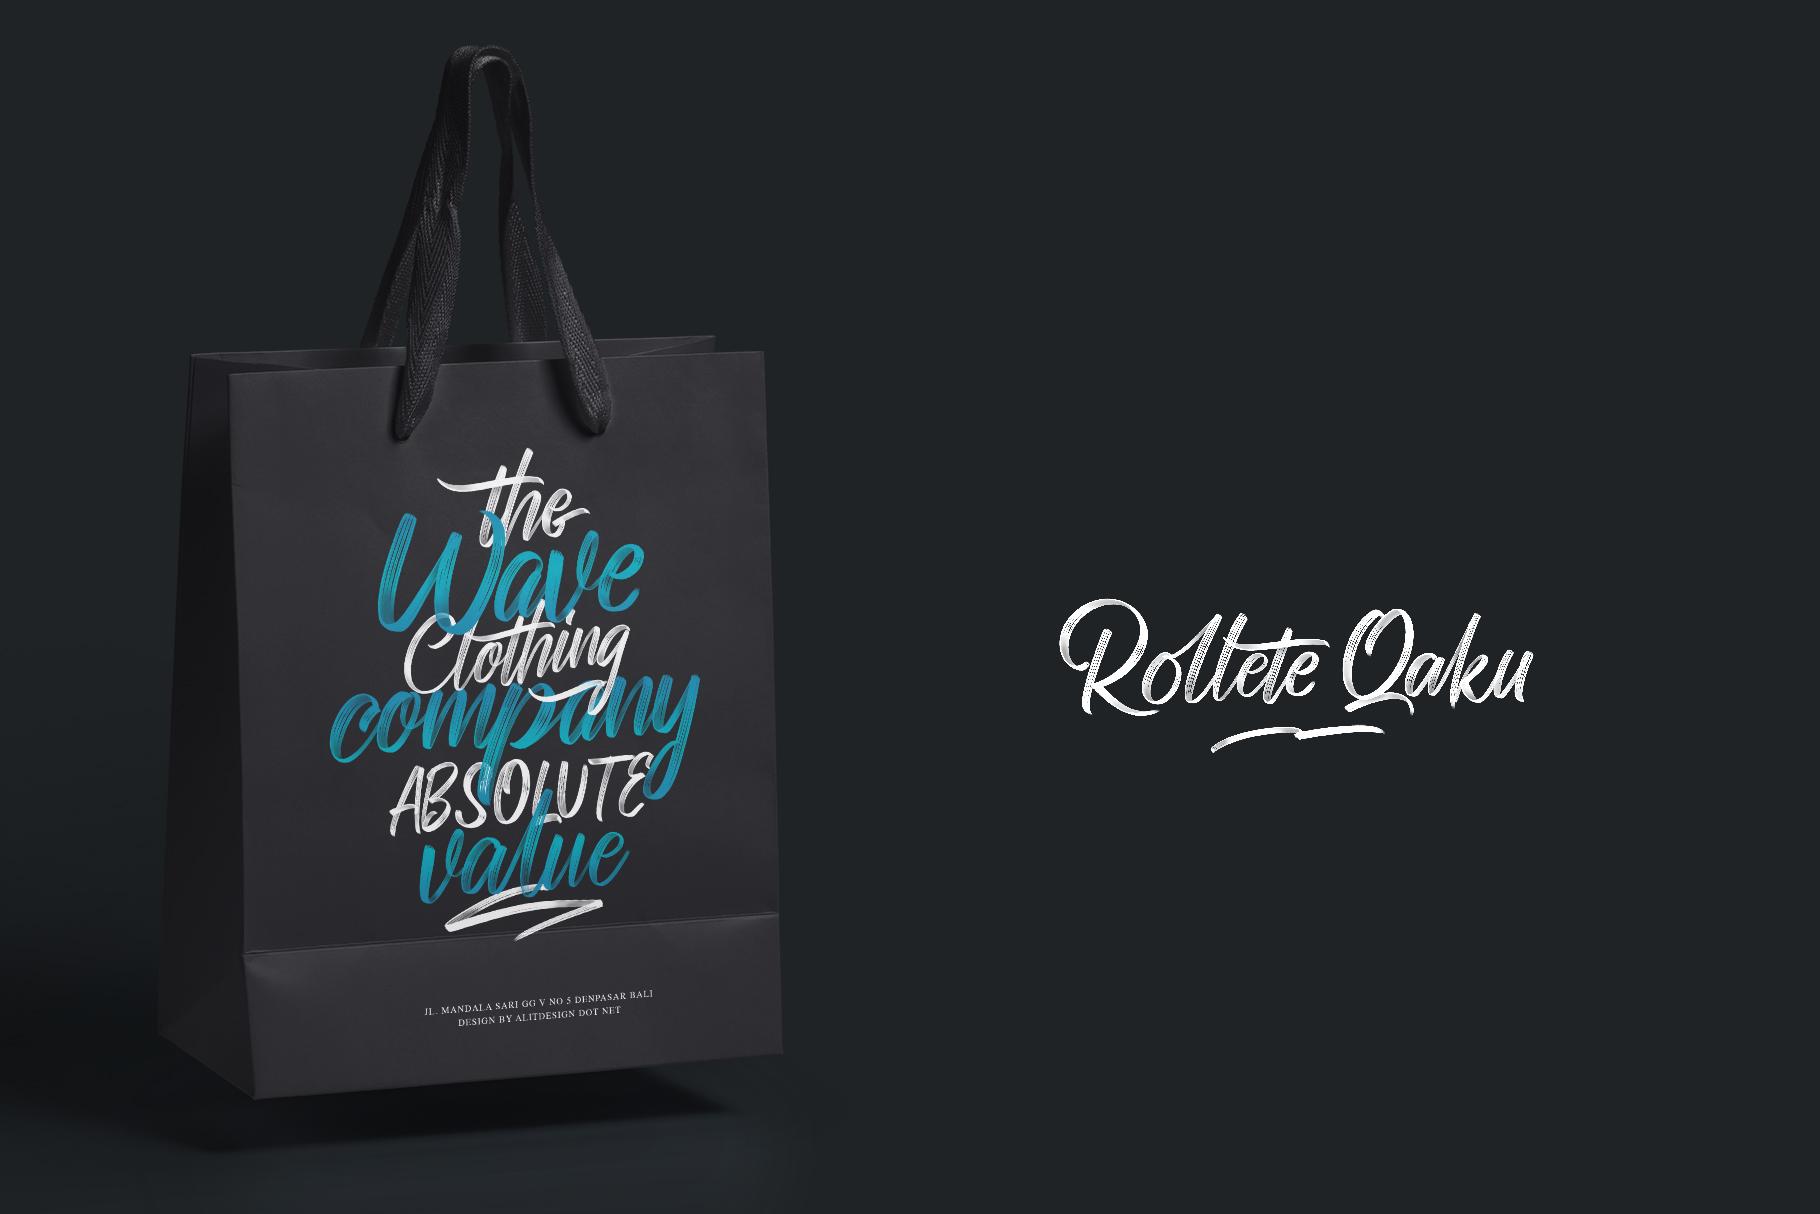 Rollete Qaku SVG & Regular fonts example image 2